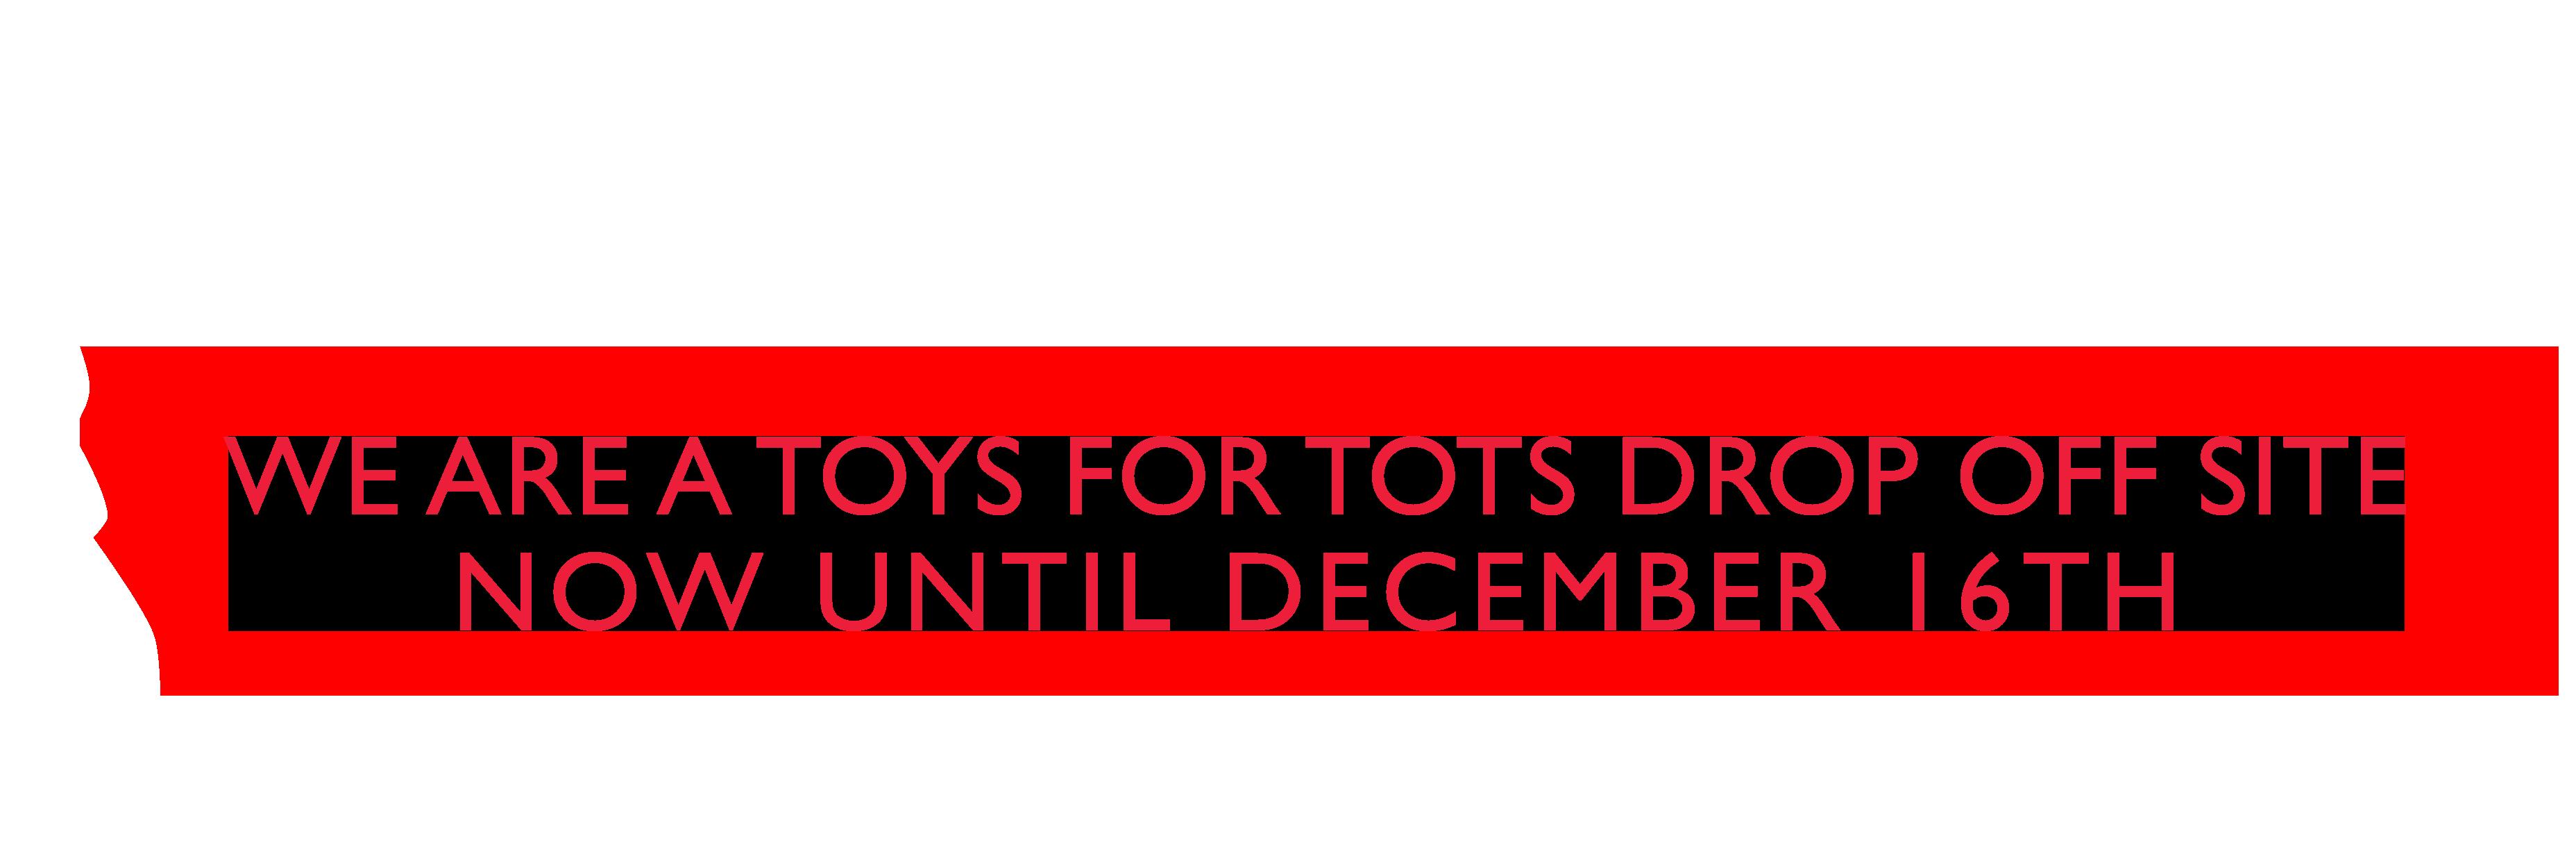 Sidelines_ToysForTots_Poster-toys logo-text.png